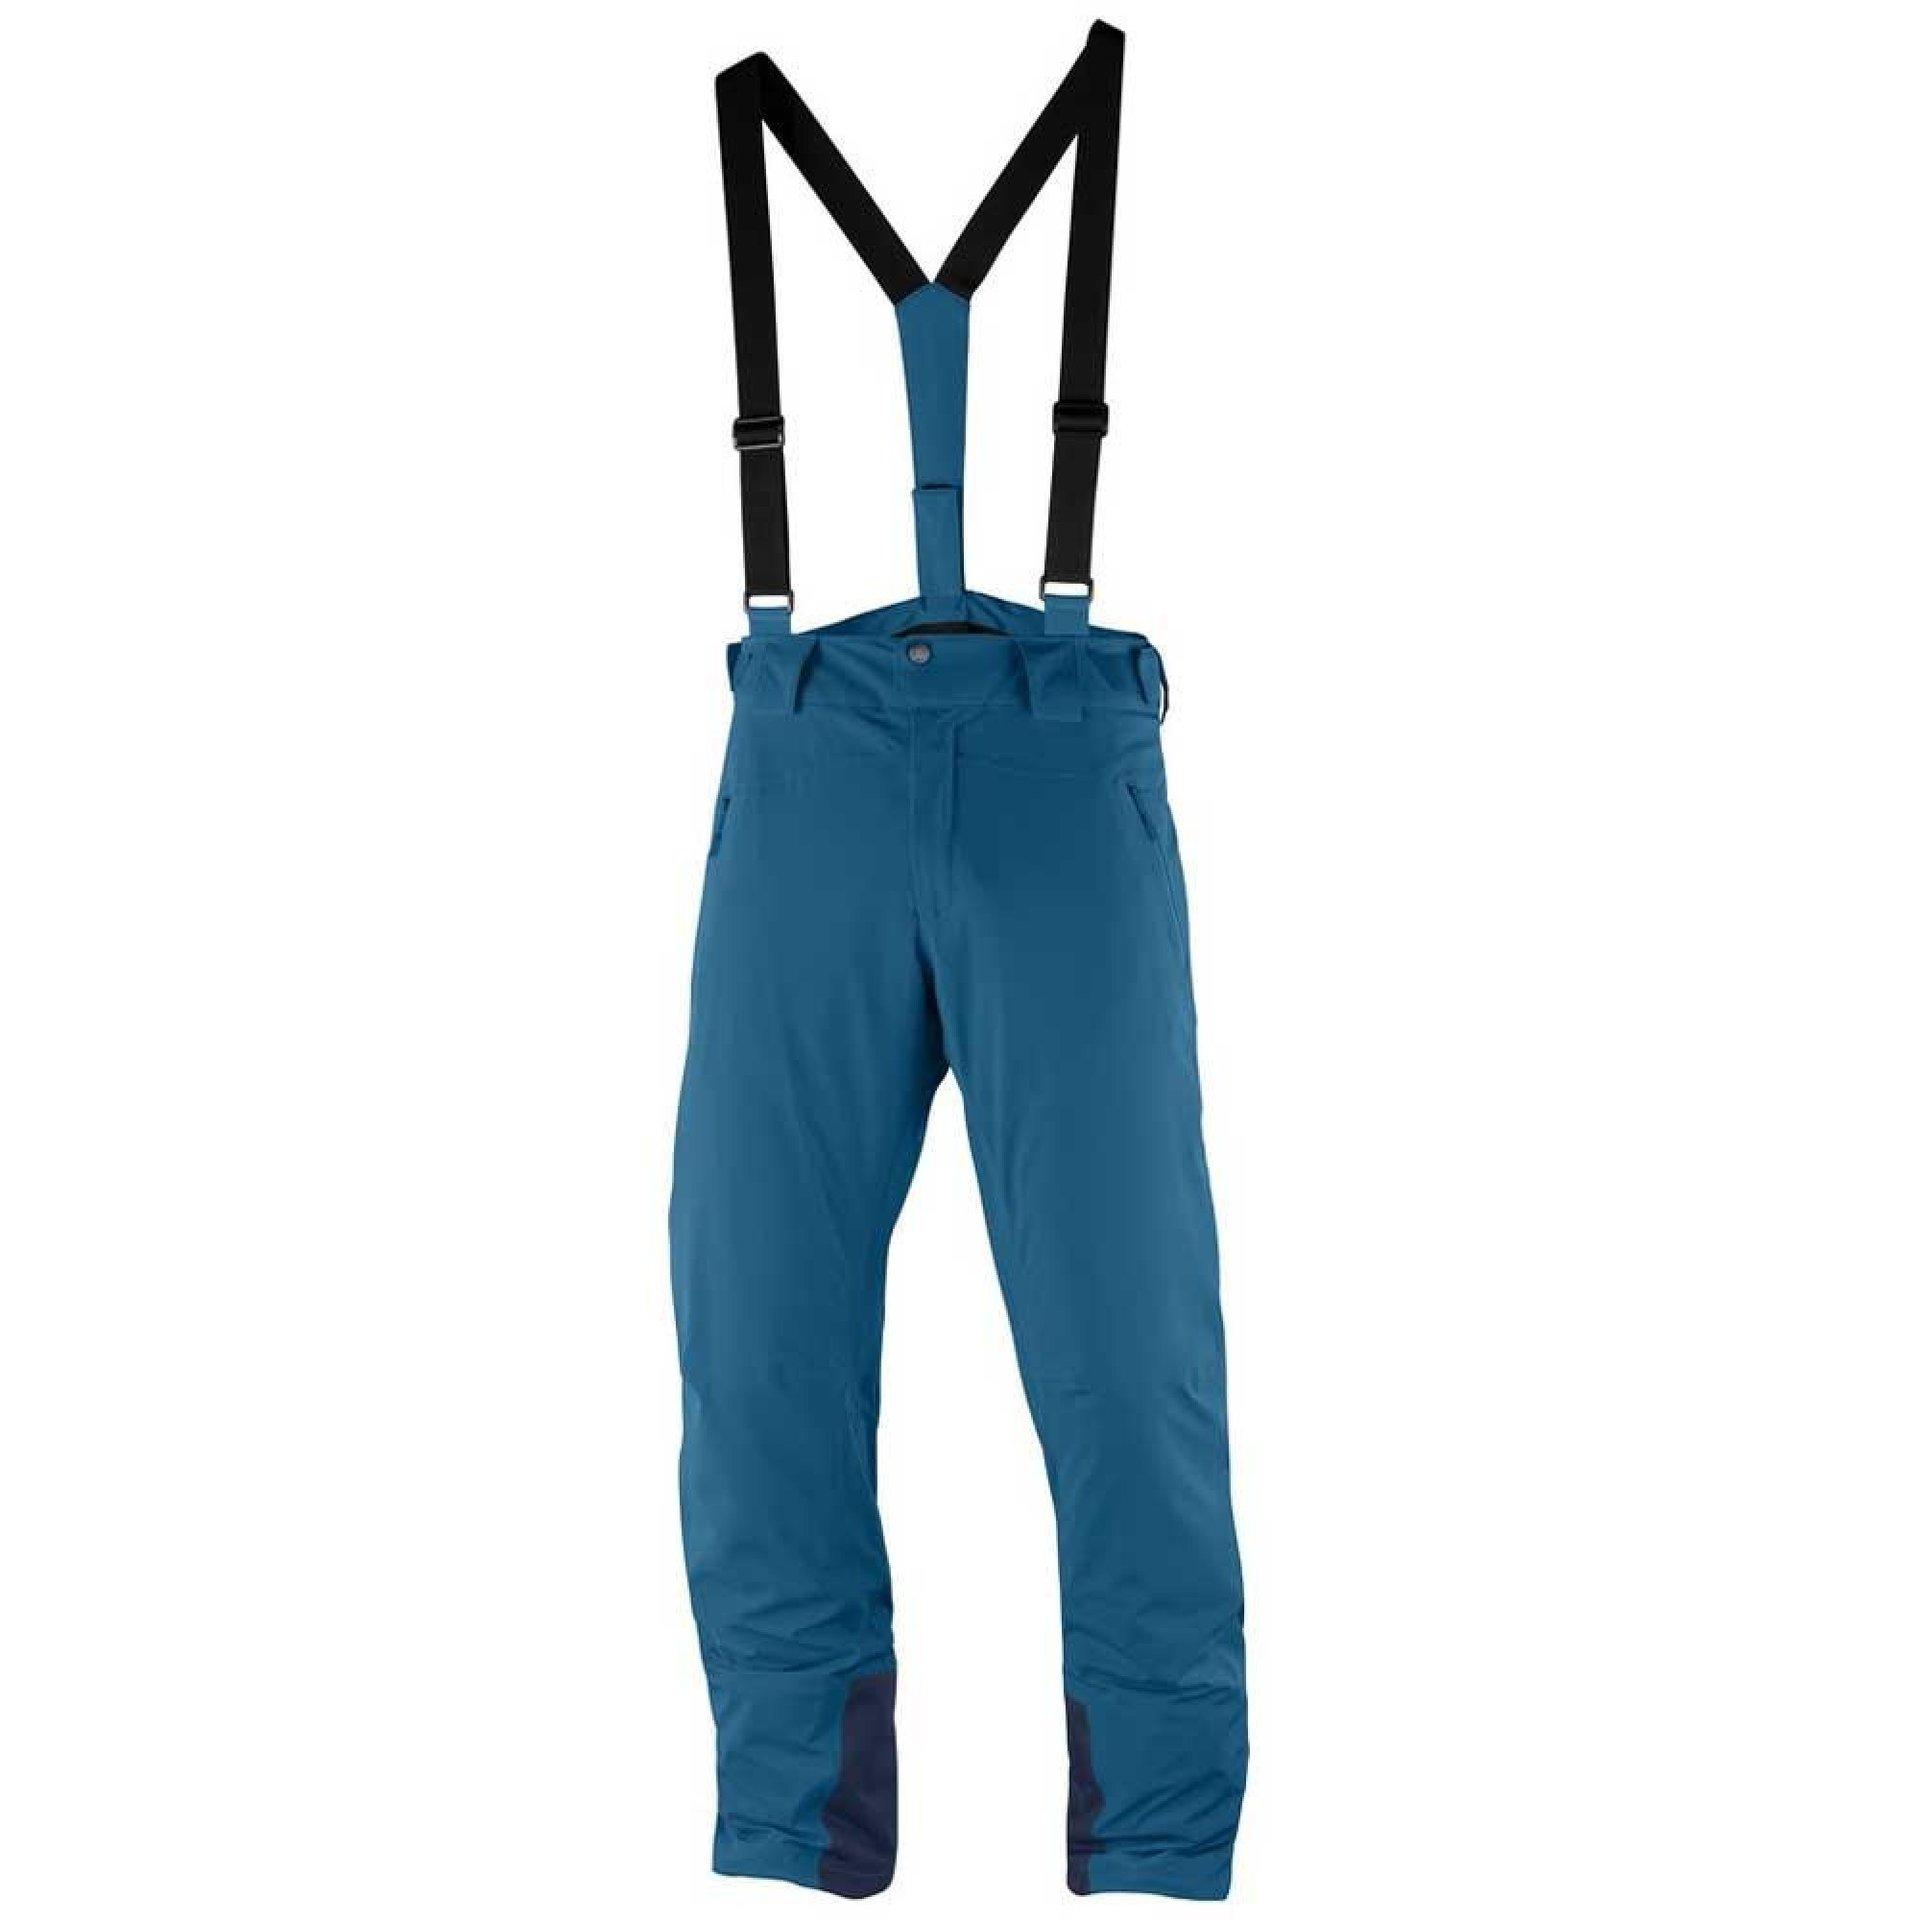 SPODNIE SALOMON ICEGLORY PANT M REGULAR MOROCCAN BLUE